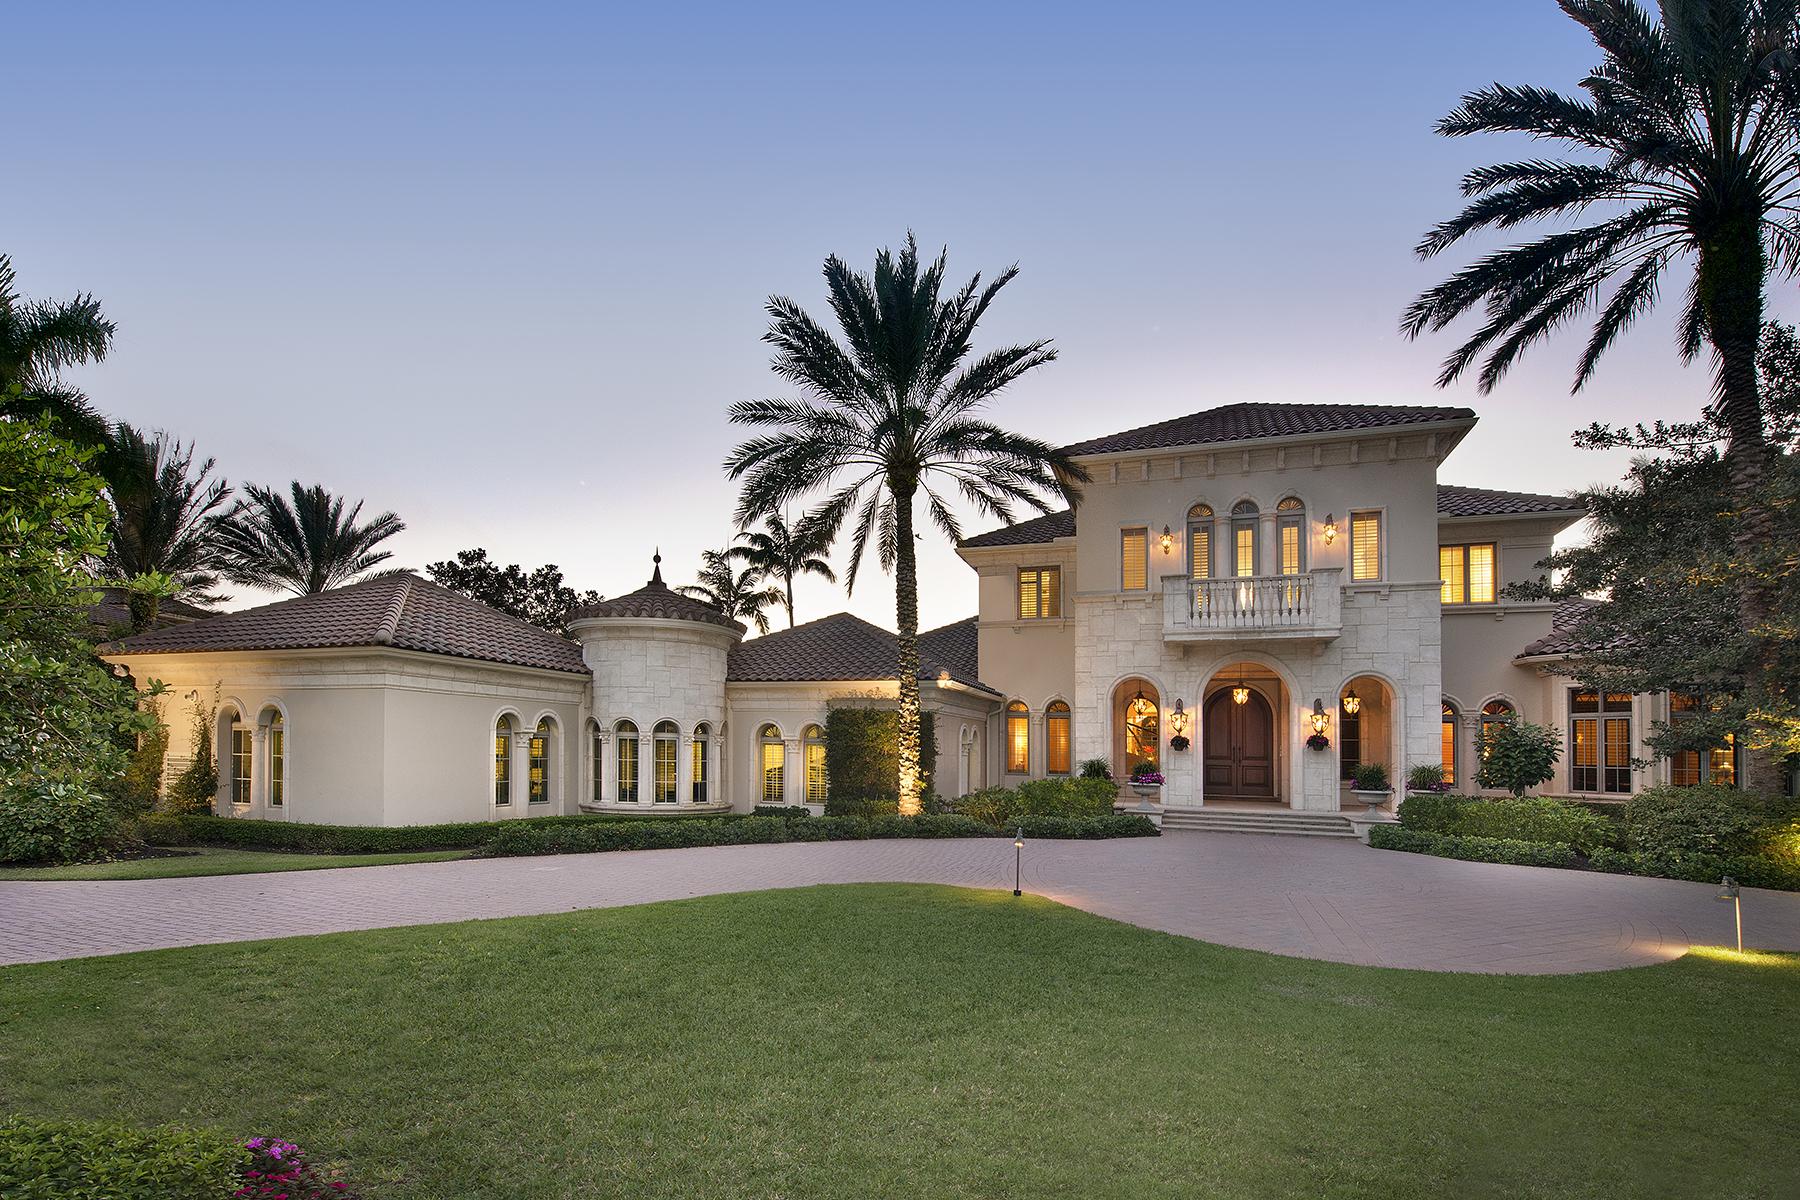 独户住宅 为 销售 在 Estuary at Grey Oaks 1397 Great Egret Trl Estuary At Grey Oaks, 那不勒斯, 佛罗里达州, 34105 美国